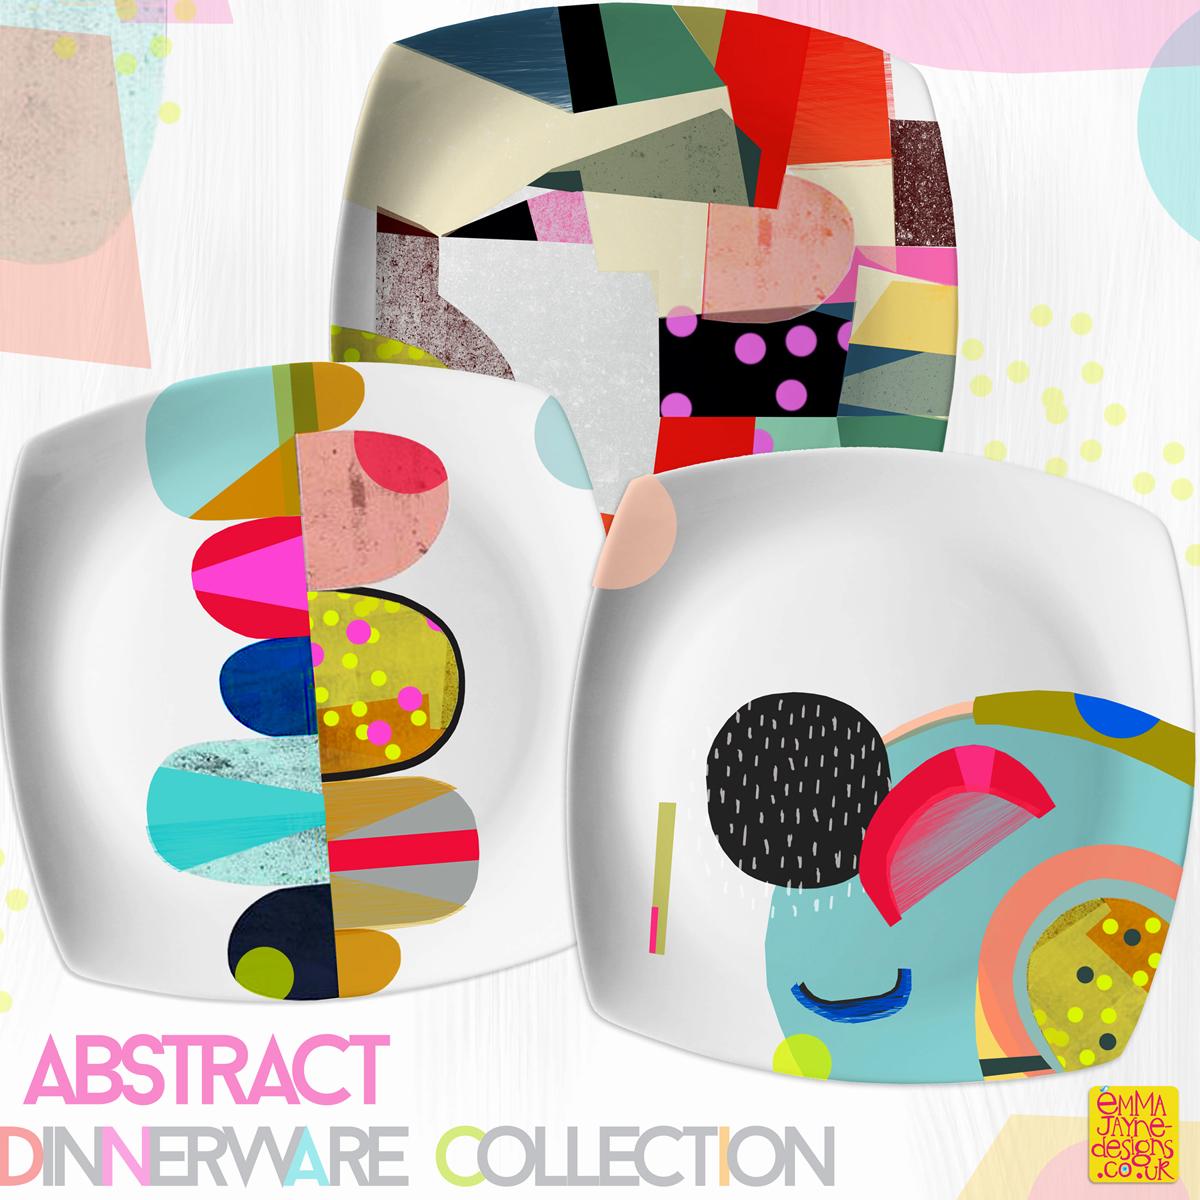 bright-abstract-dinnerware-collection-emmajayne-designs  sc 1 st  Emma Jayne Designs & Blog ArchiveBright abstract dinnerware collection -